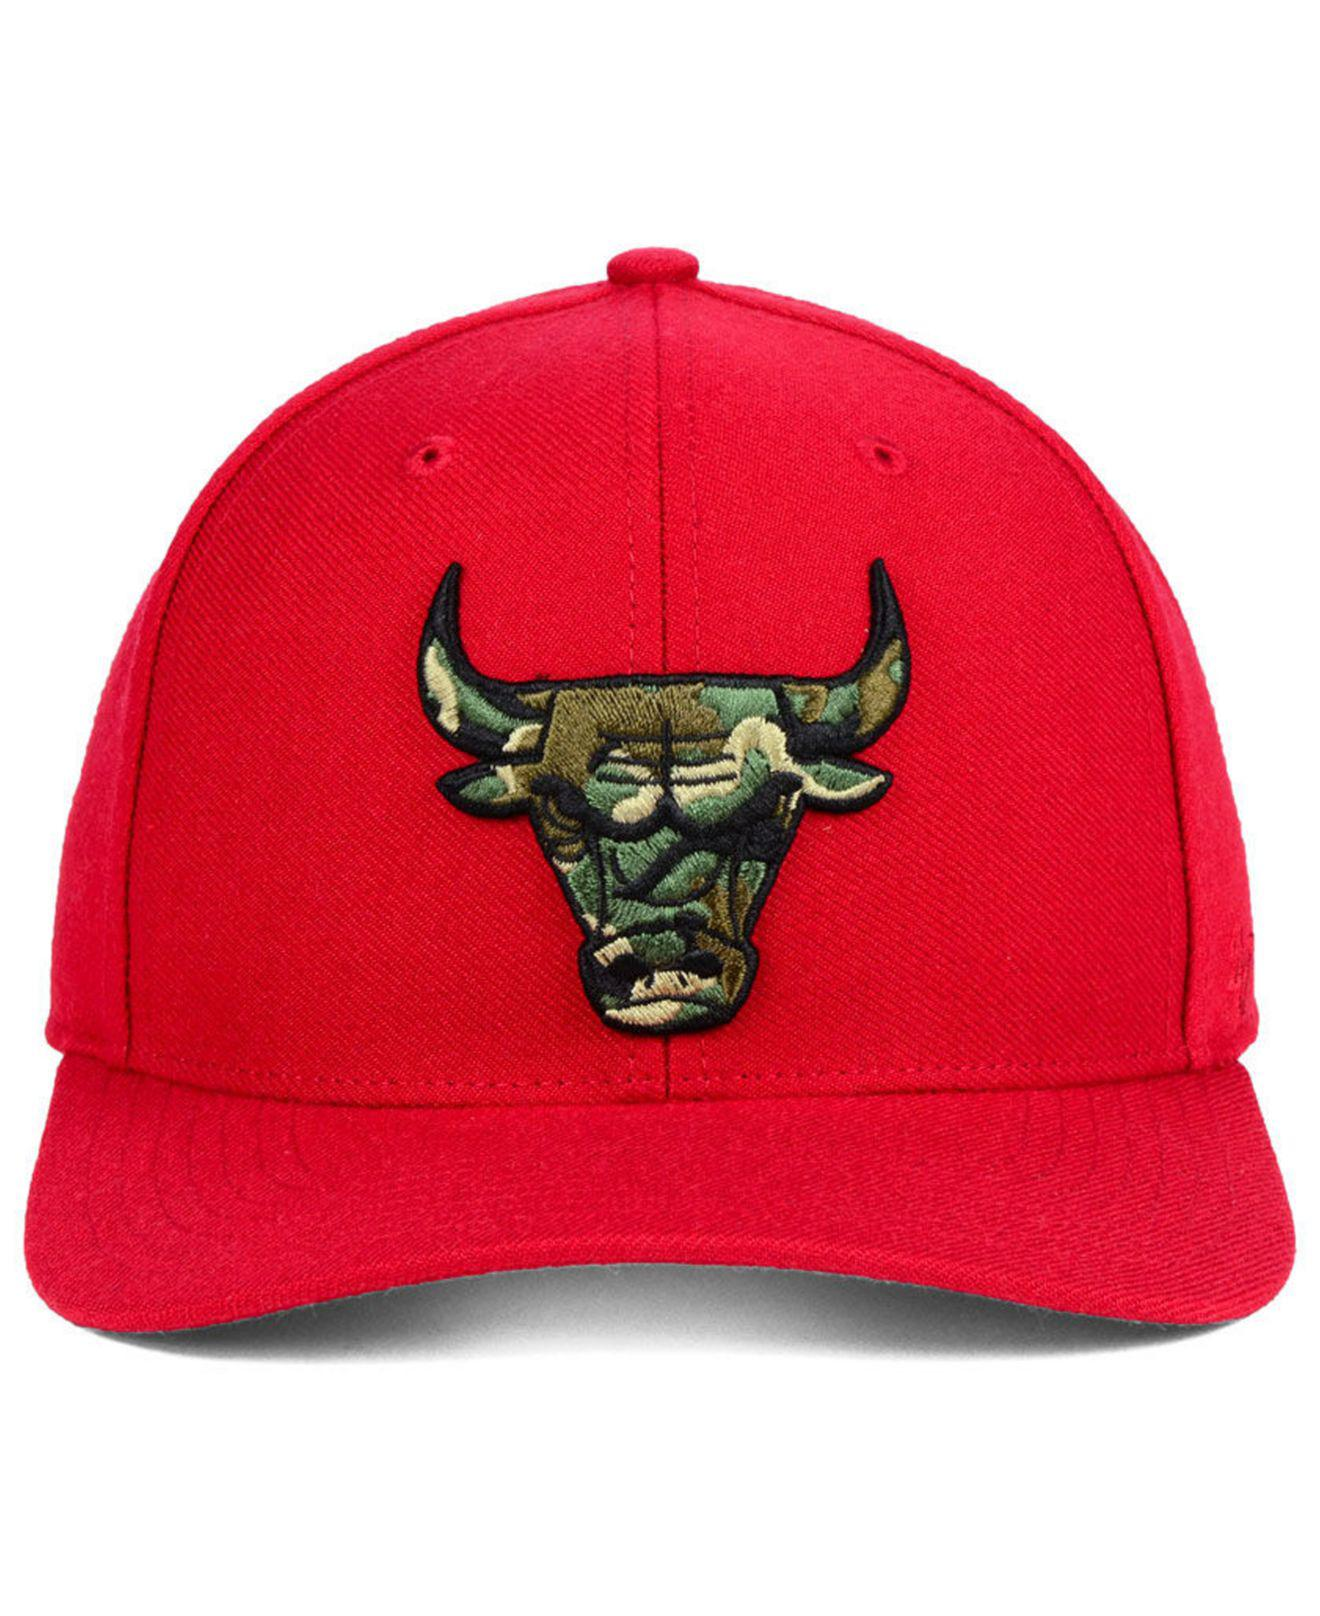 outlet store 046de 6024a ... promo code for lyst 47 brand chicago bulls camfill mvp cap in red for  men 37894